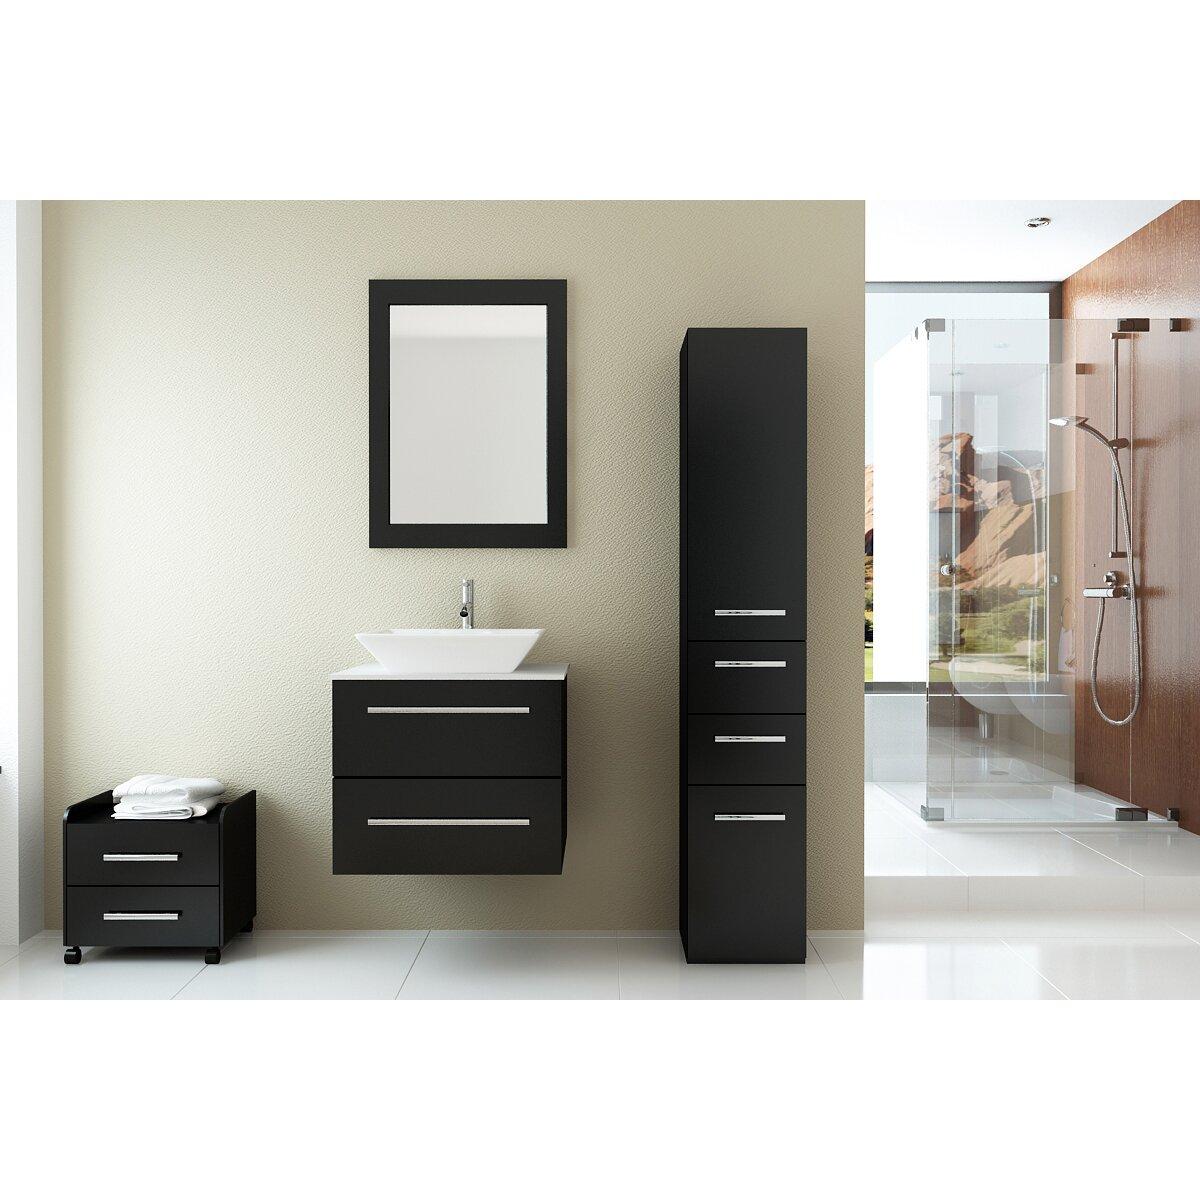 Jwh Living Carina 24 Single Wall Mounted Bathroom Vanity Set Reviews Wayfair